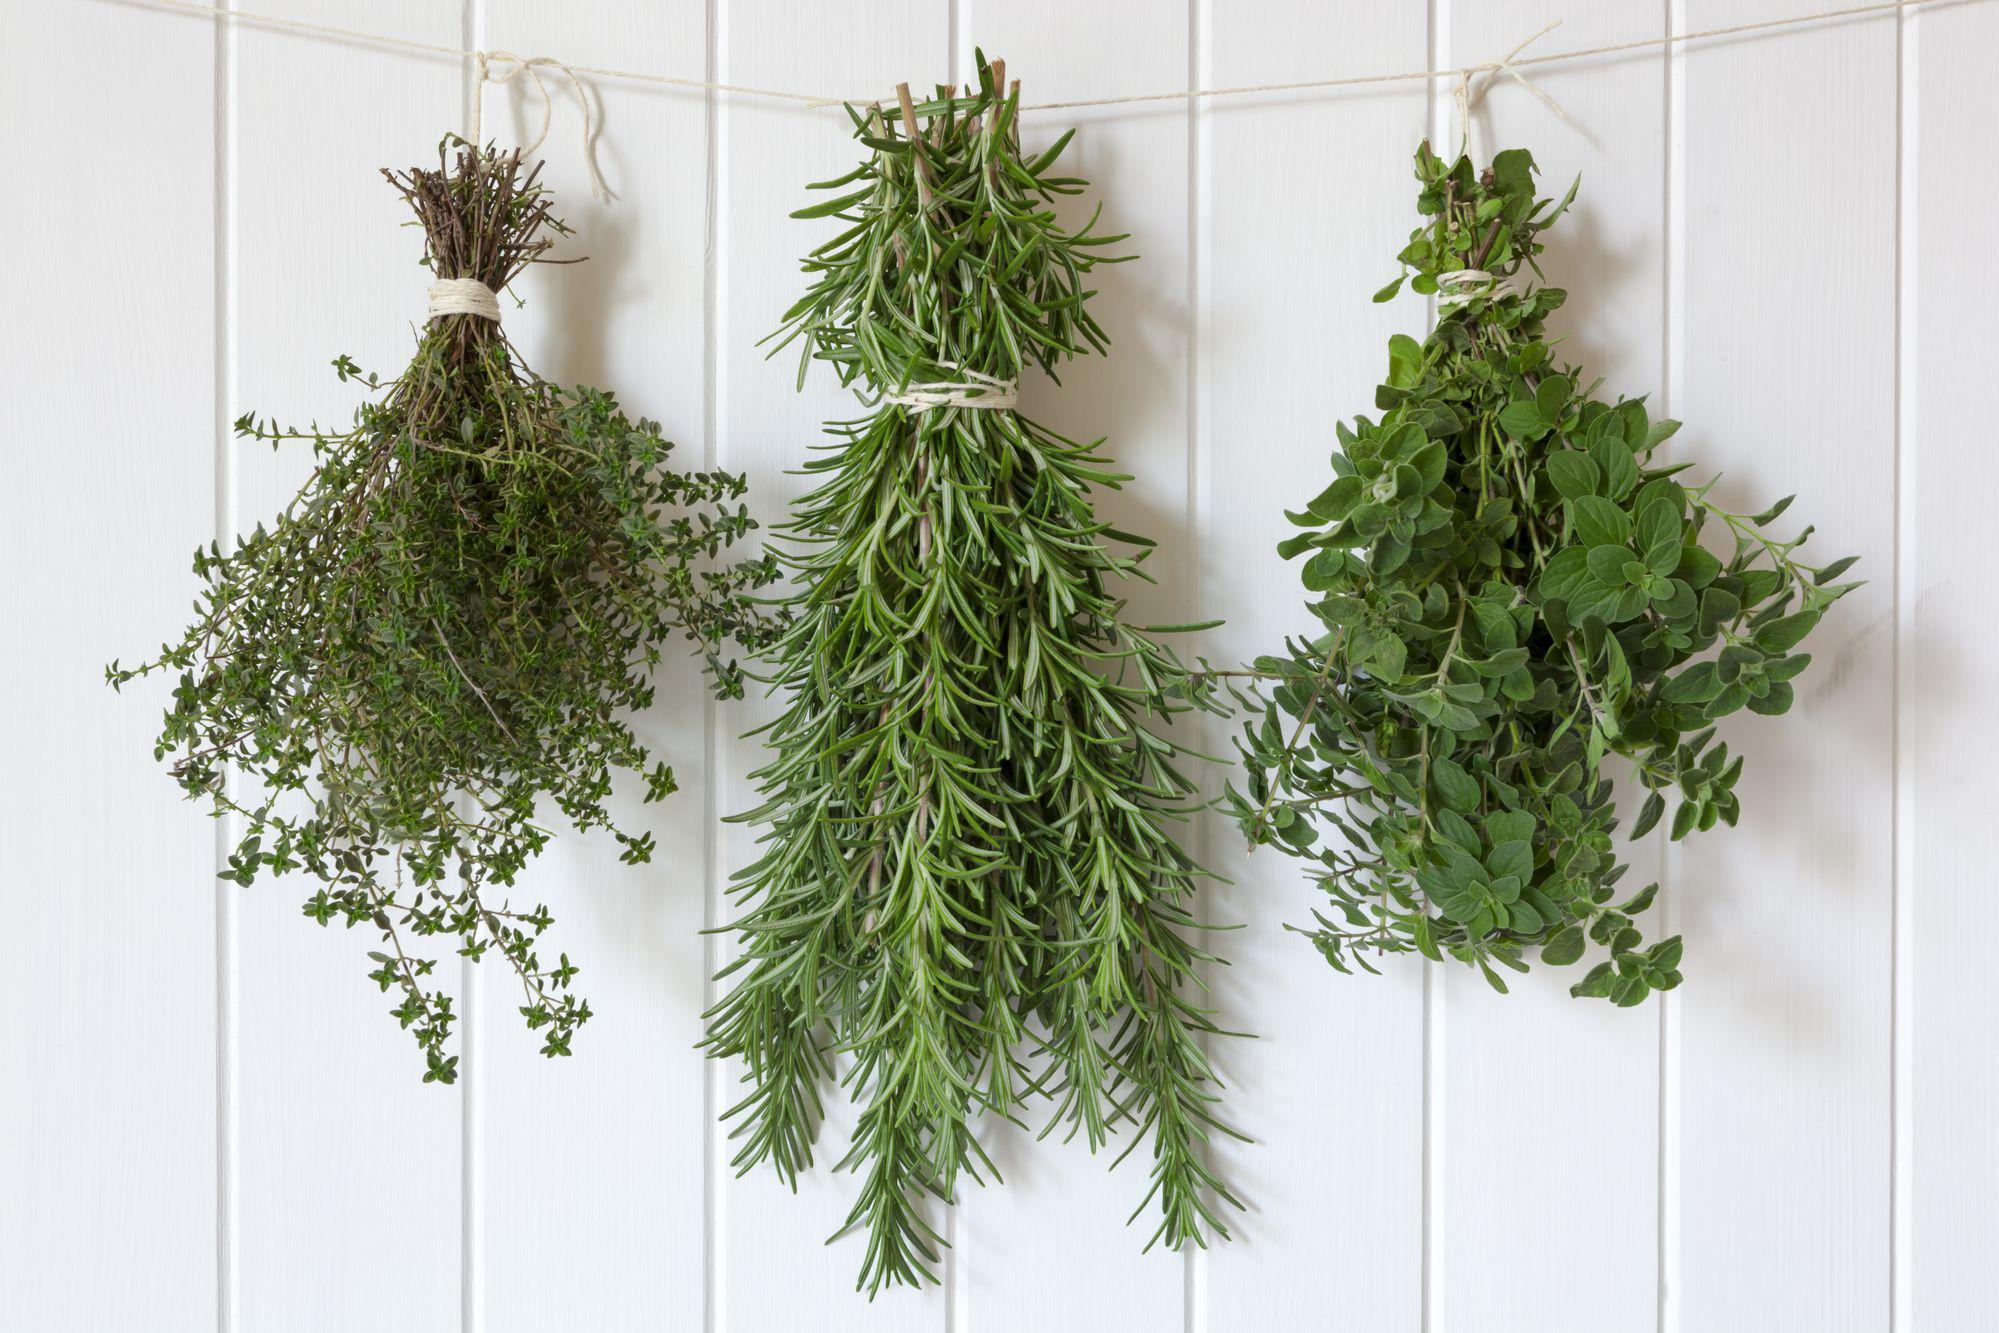 Hanging mistletoe around the holidays is creepy. Hang herbs instead.